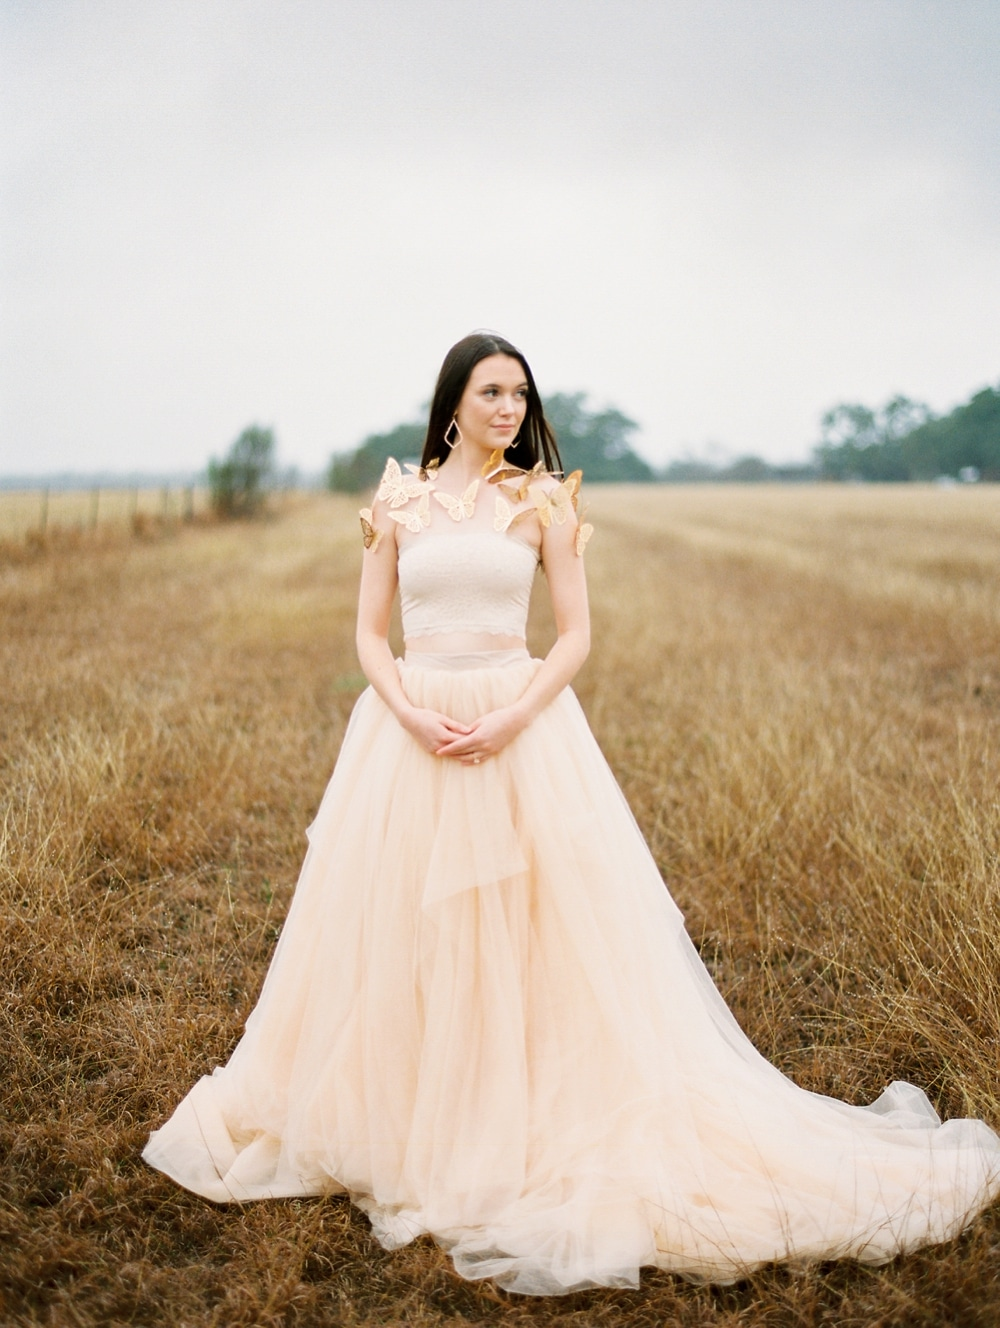 Kristin-La-Voie-Photography-fine-art-wedding-bridal-boudoir-texas-photographer-Dallas-Austin-San-Marcos-wahwahtaysee-resort-27